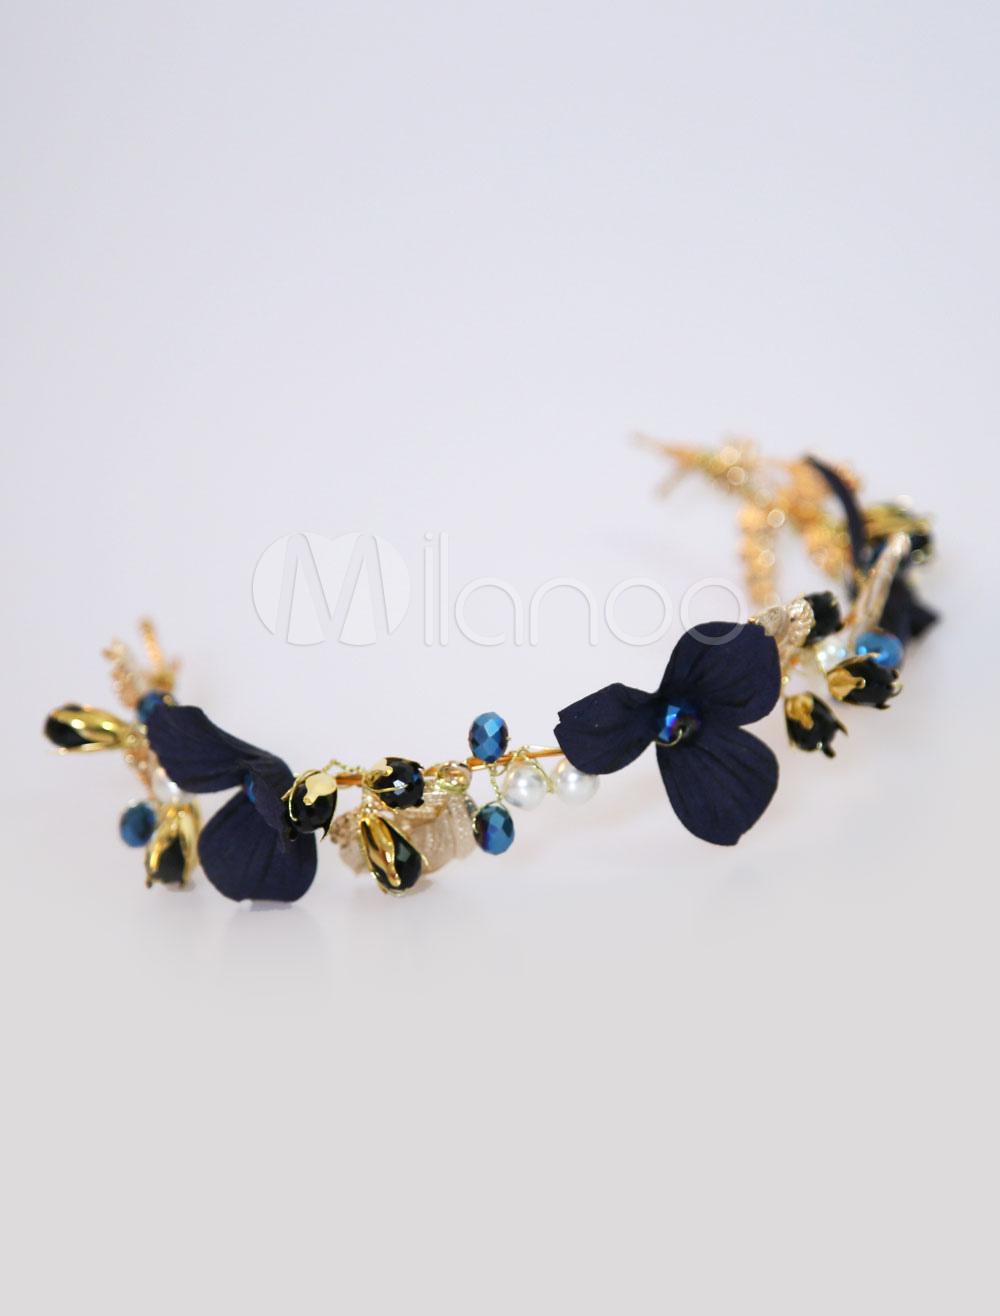 Buy Flower Wedding Headpieces Crystal Headband Dark Navy Bridal Hair Accessories for $20.99 in Milanoo store